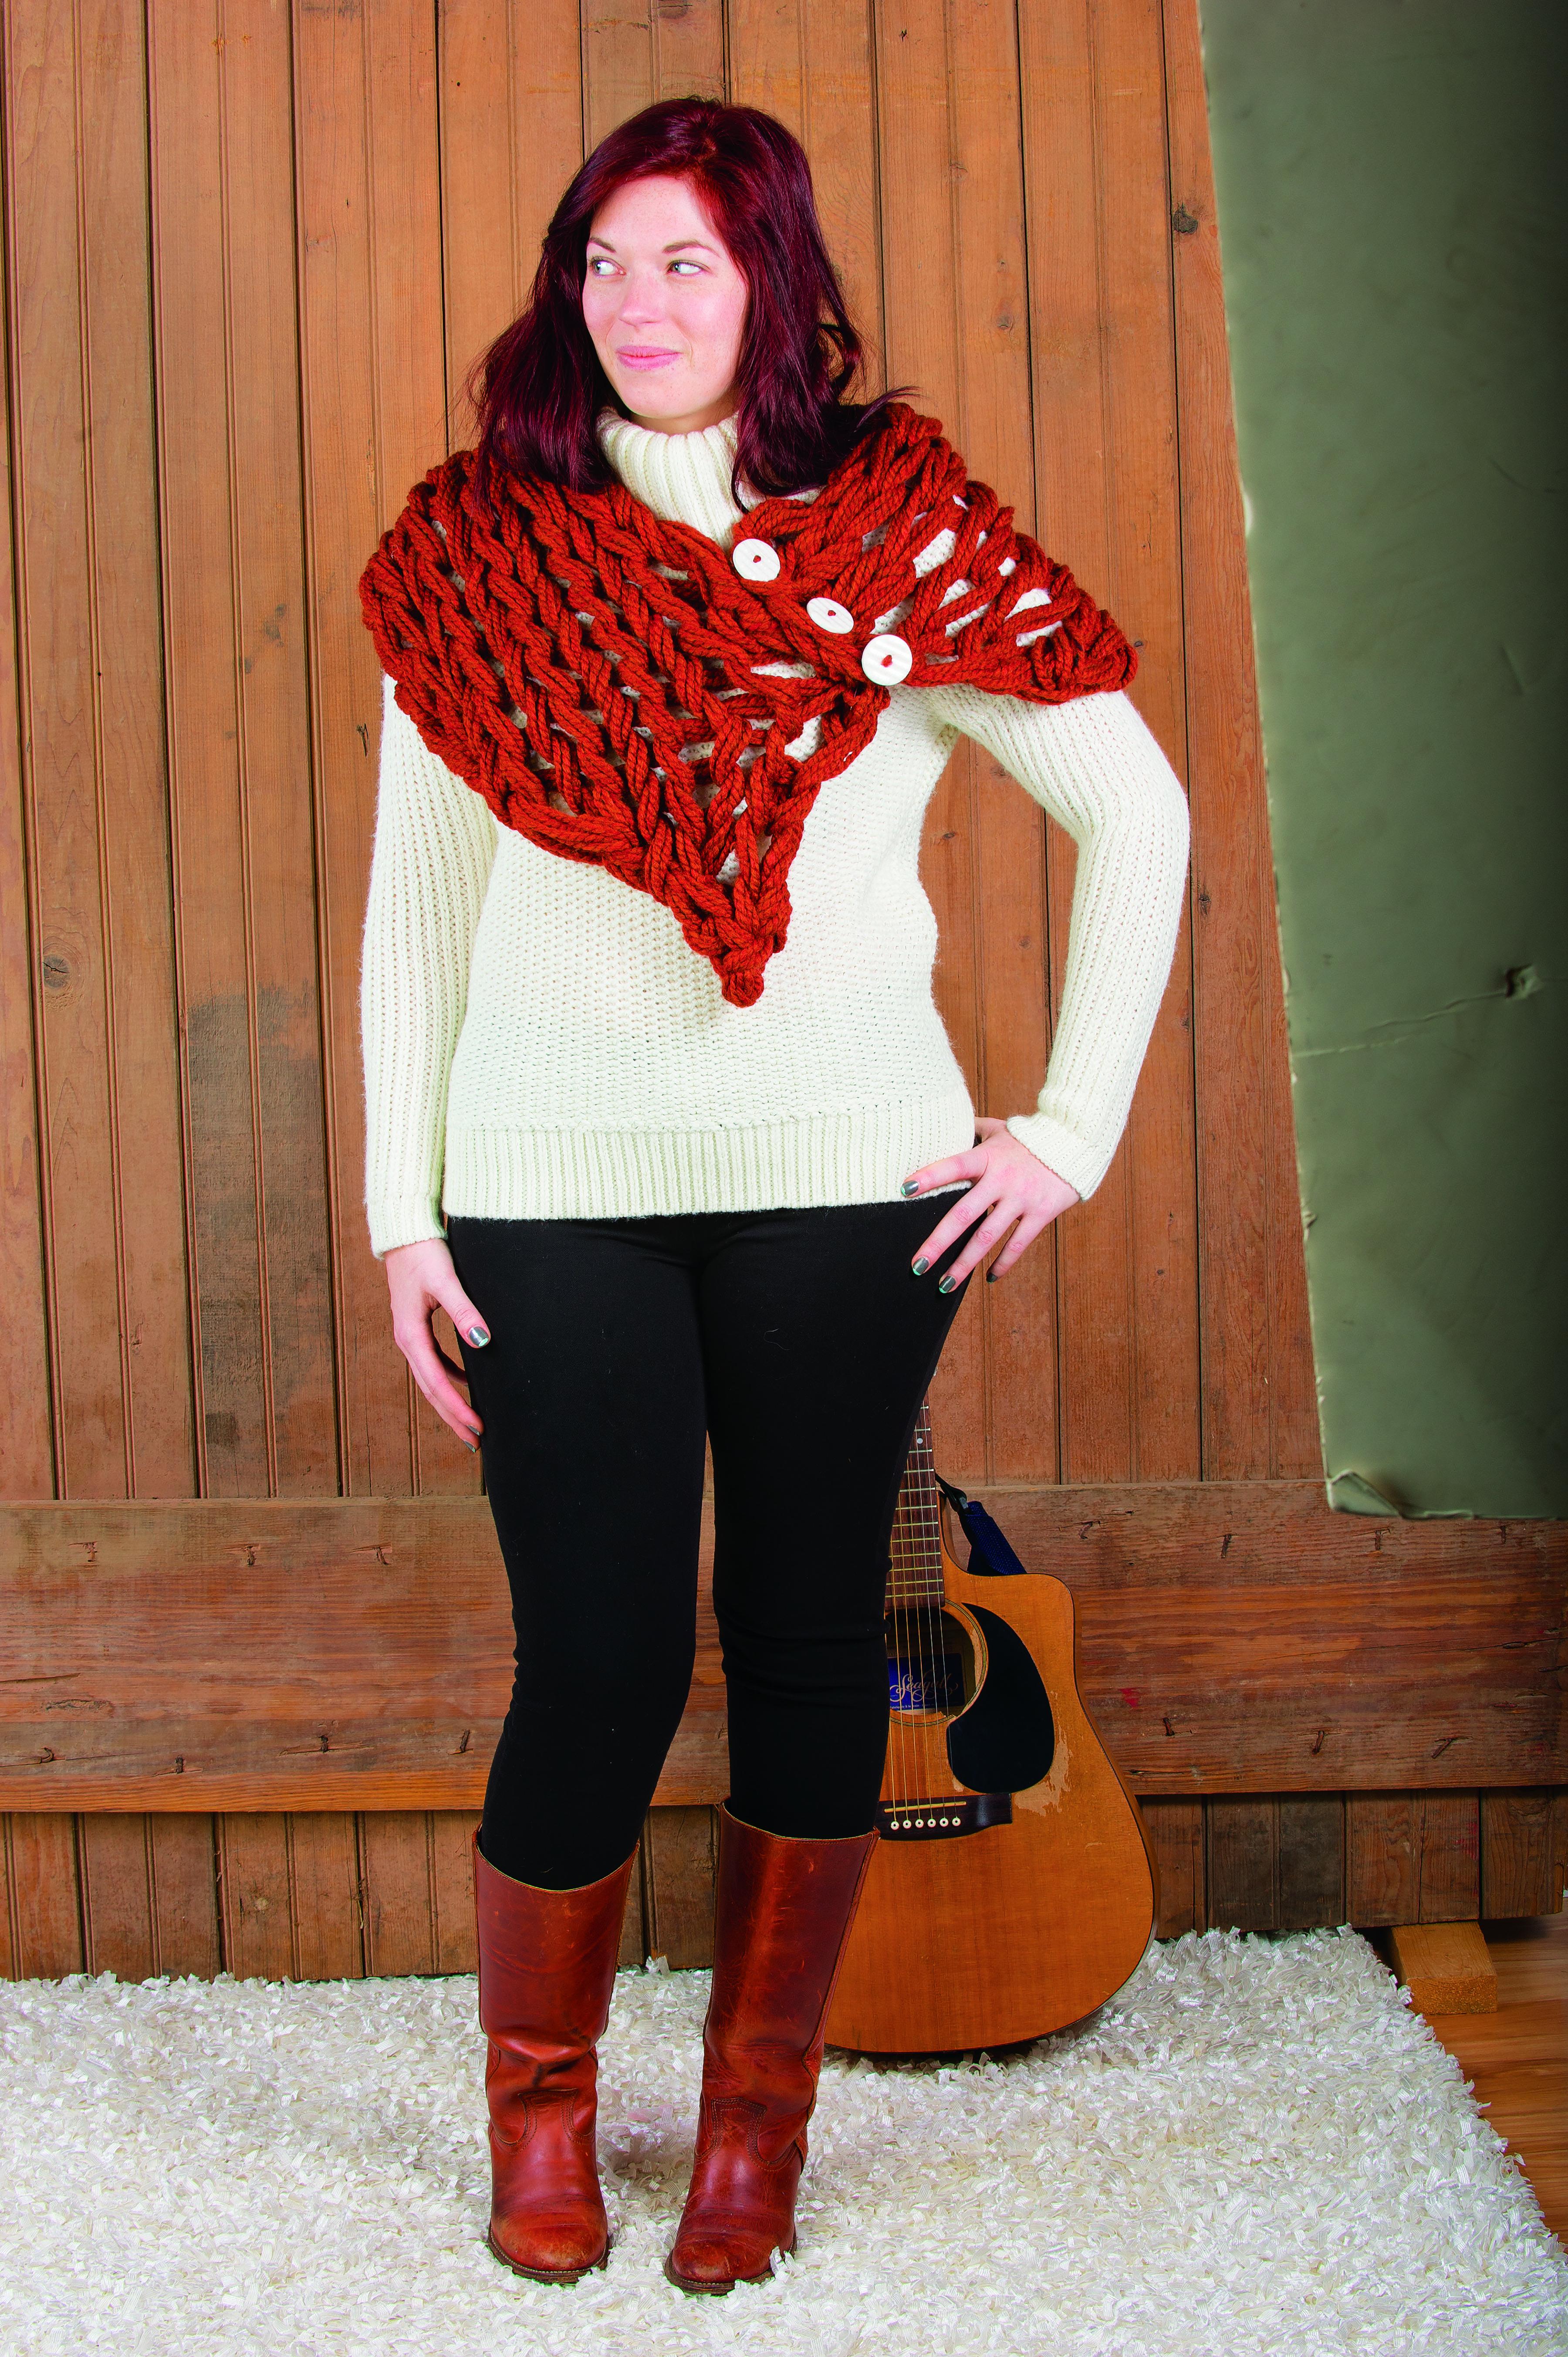 Arm Knitting Tutorial: One Point Wrap